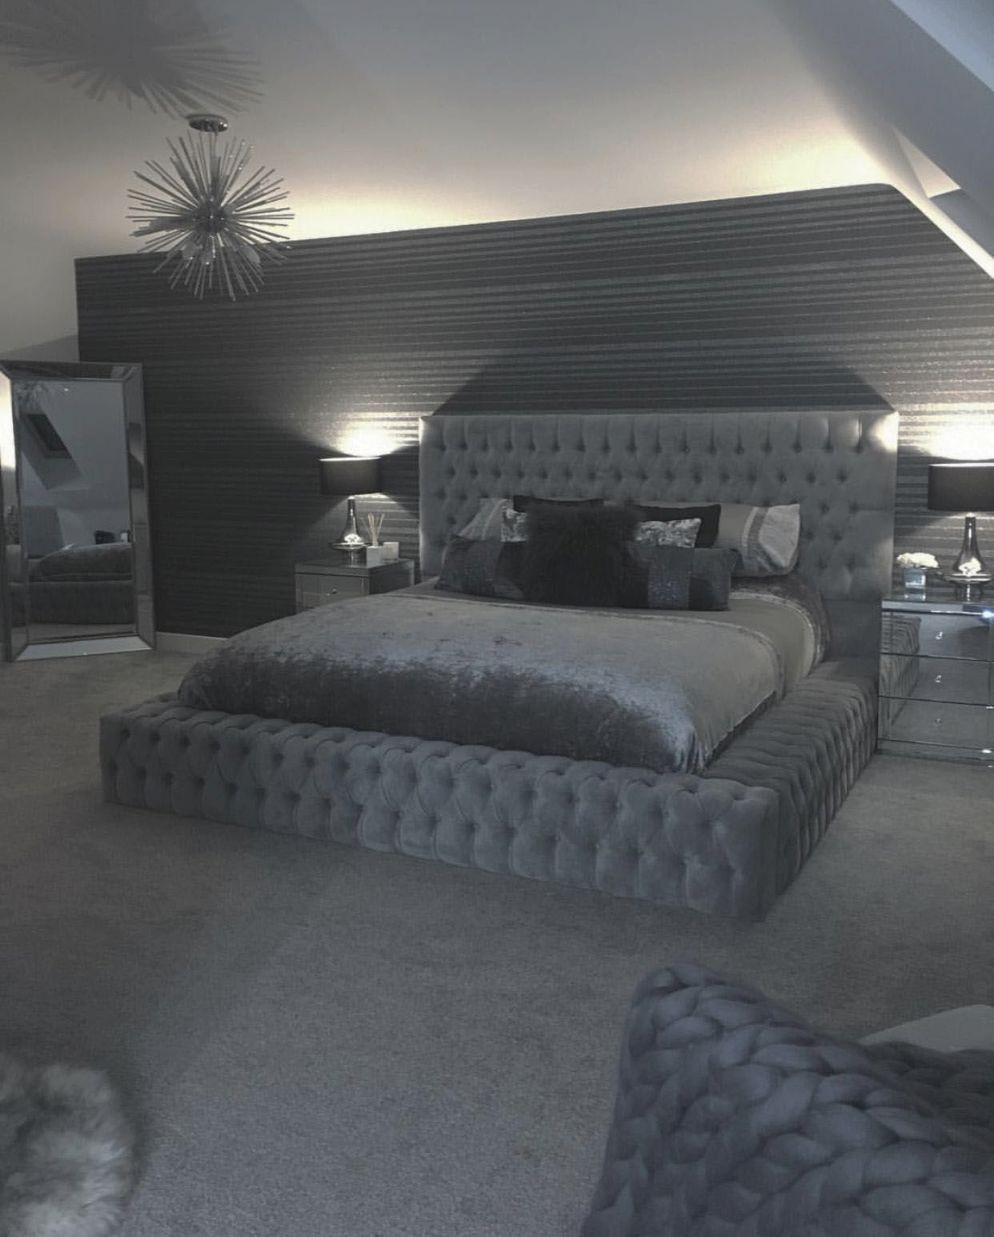 Excellent Grey White Bedroom Decorating Ideas Tips For 2020 in Bedroom Decorating Ideas Grey And White